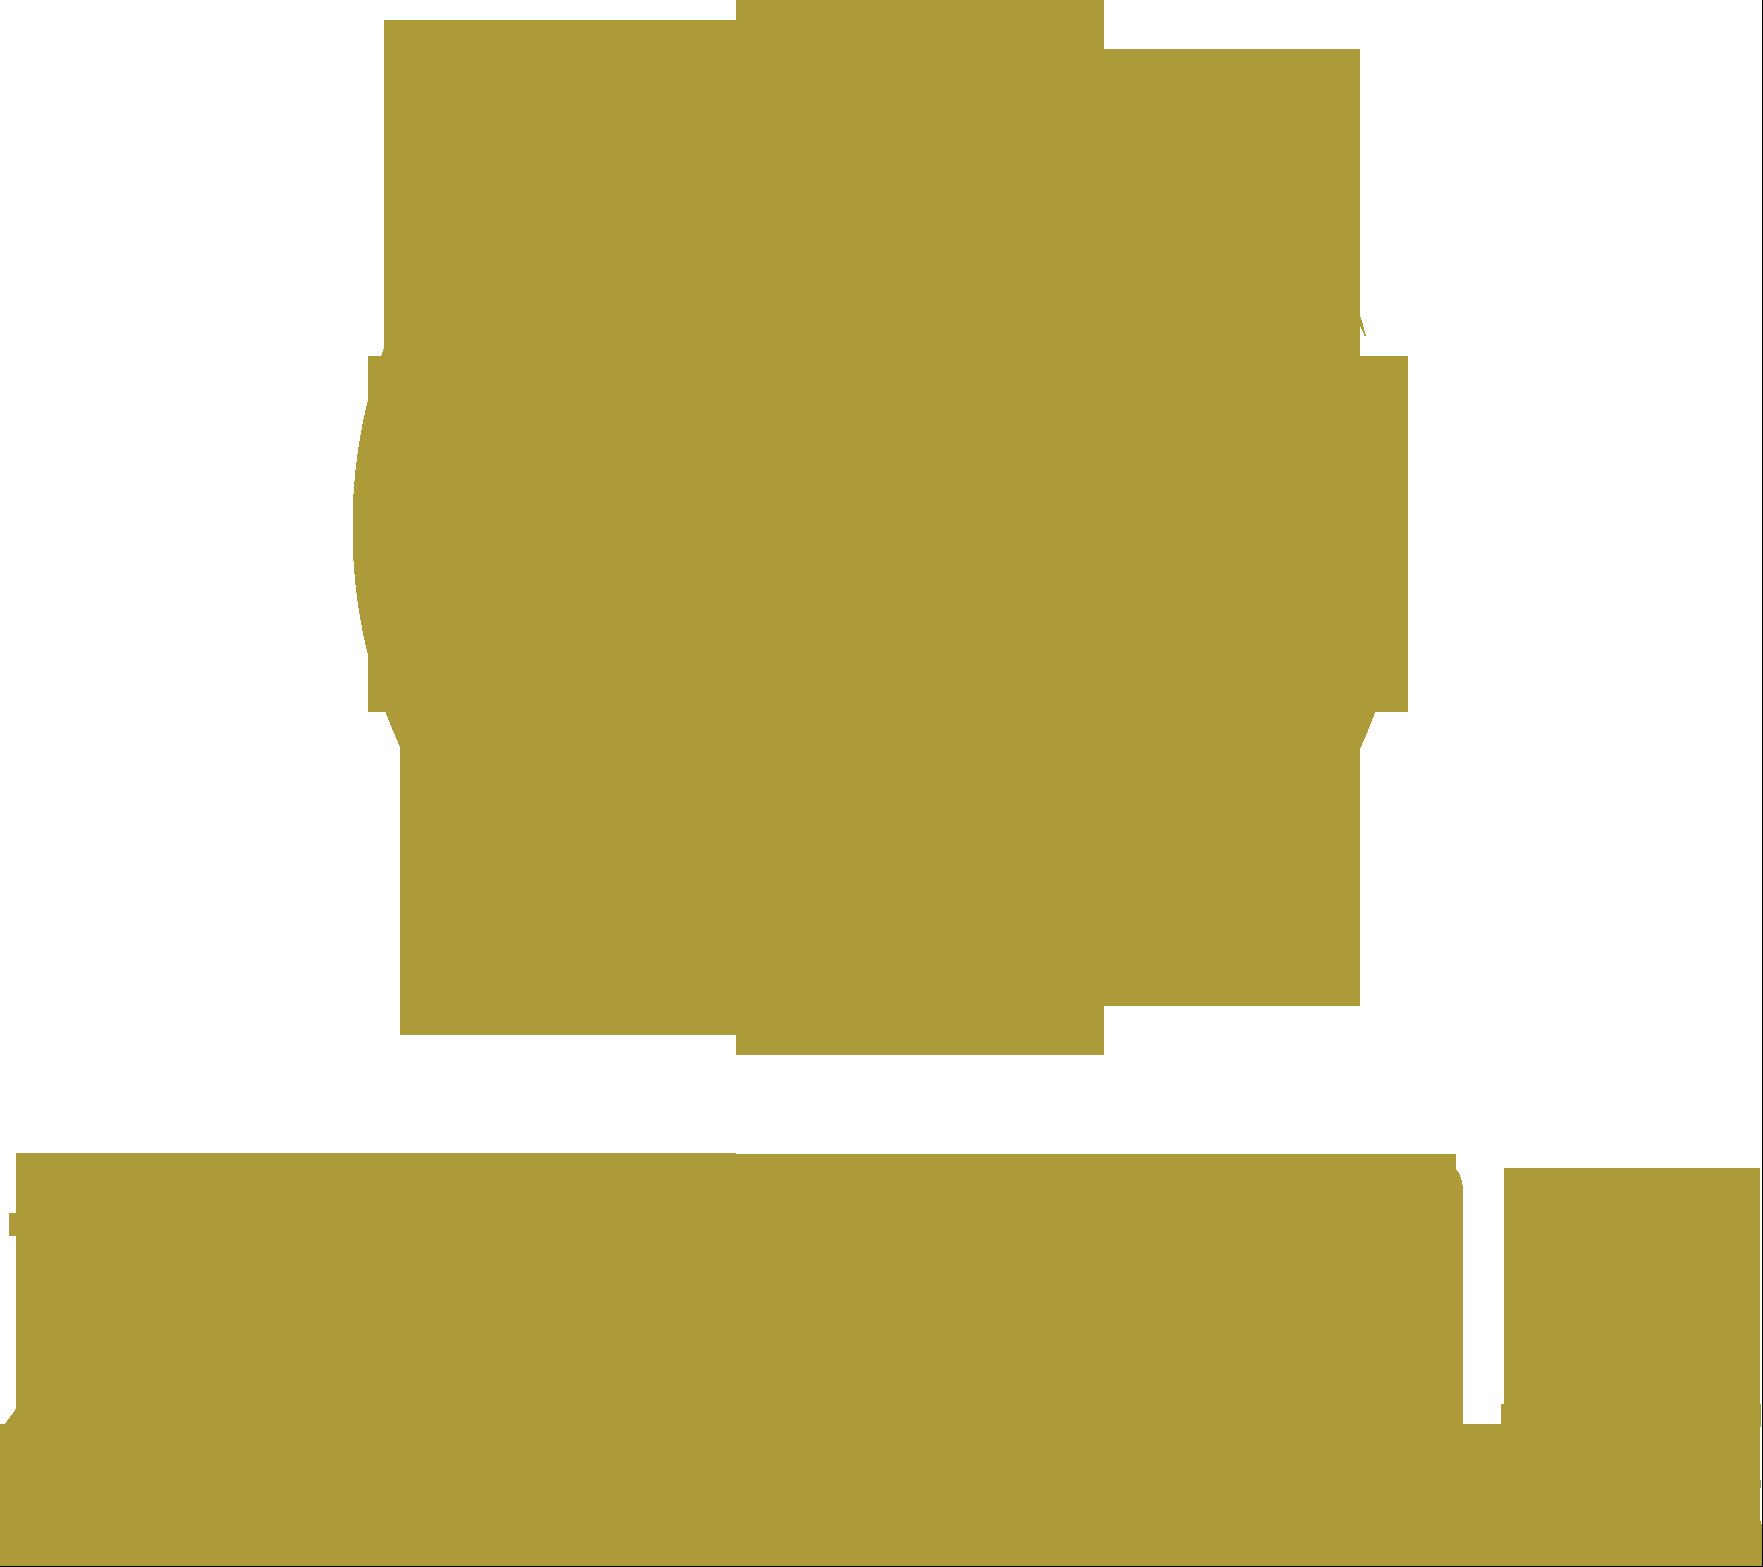 logo土黄色.jpg